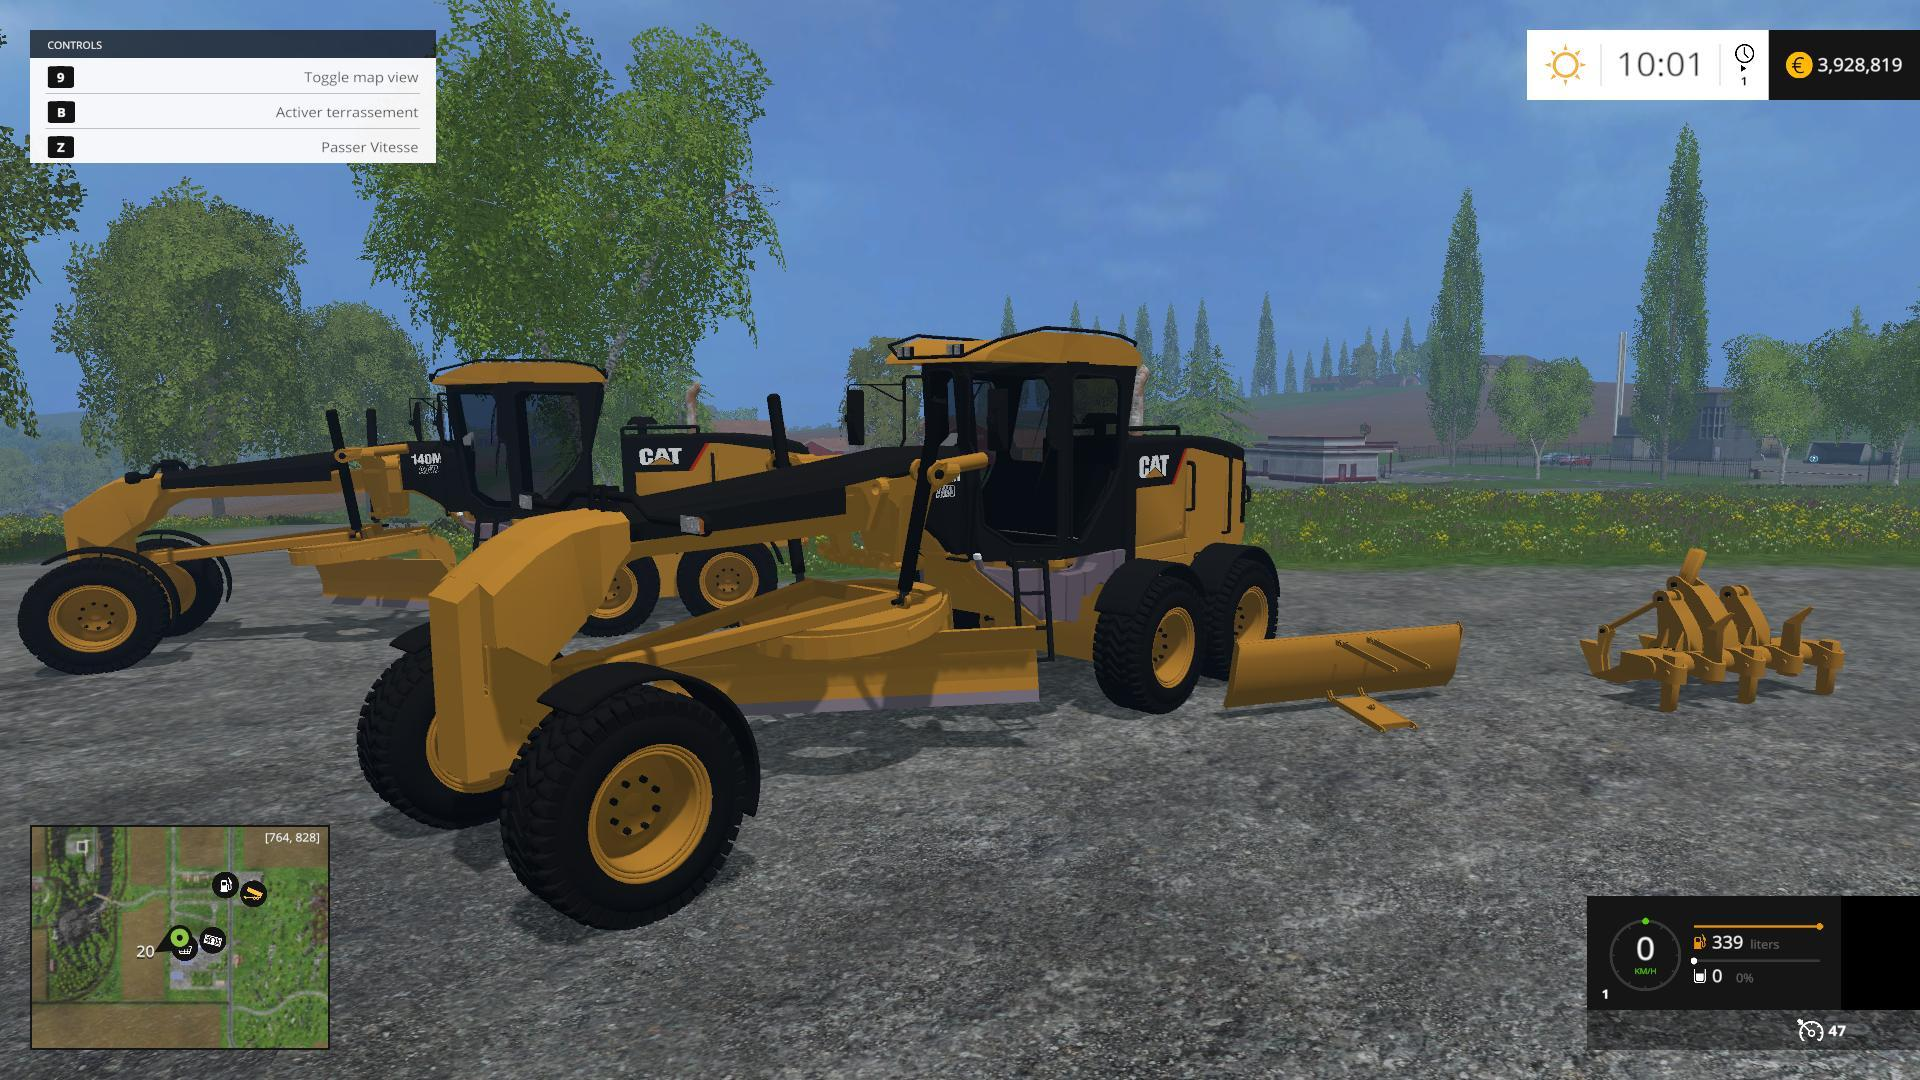 Farming simulator 15 mods - Farming simulator 19, 17, 15